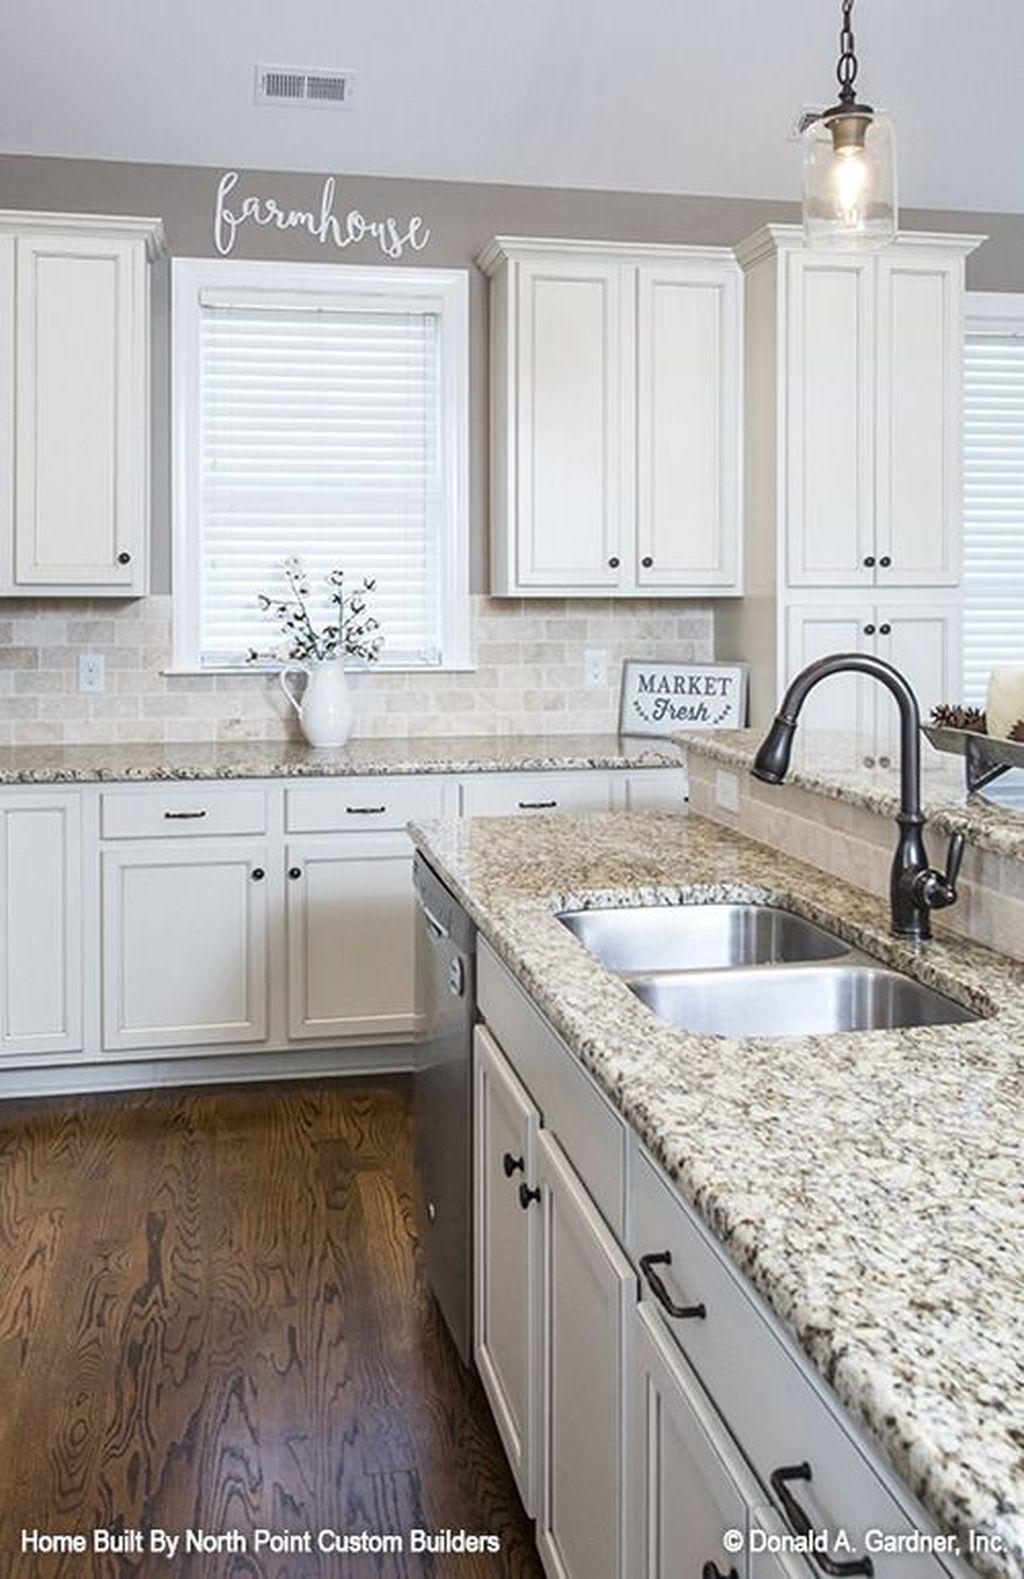 30+ Elegant Kitchens Design Décor Ideas #kitchenremodelideas